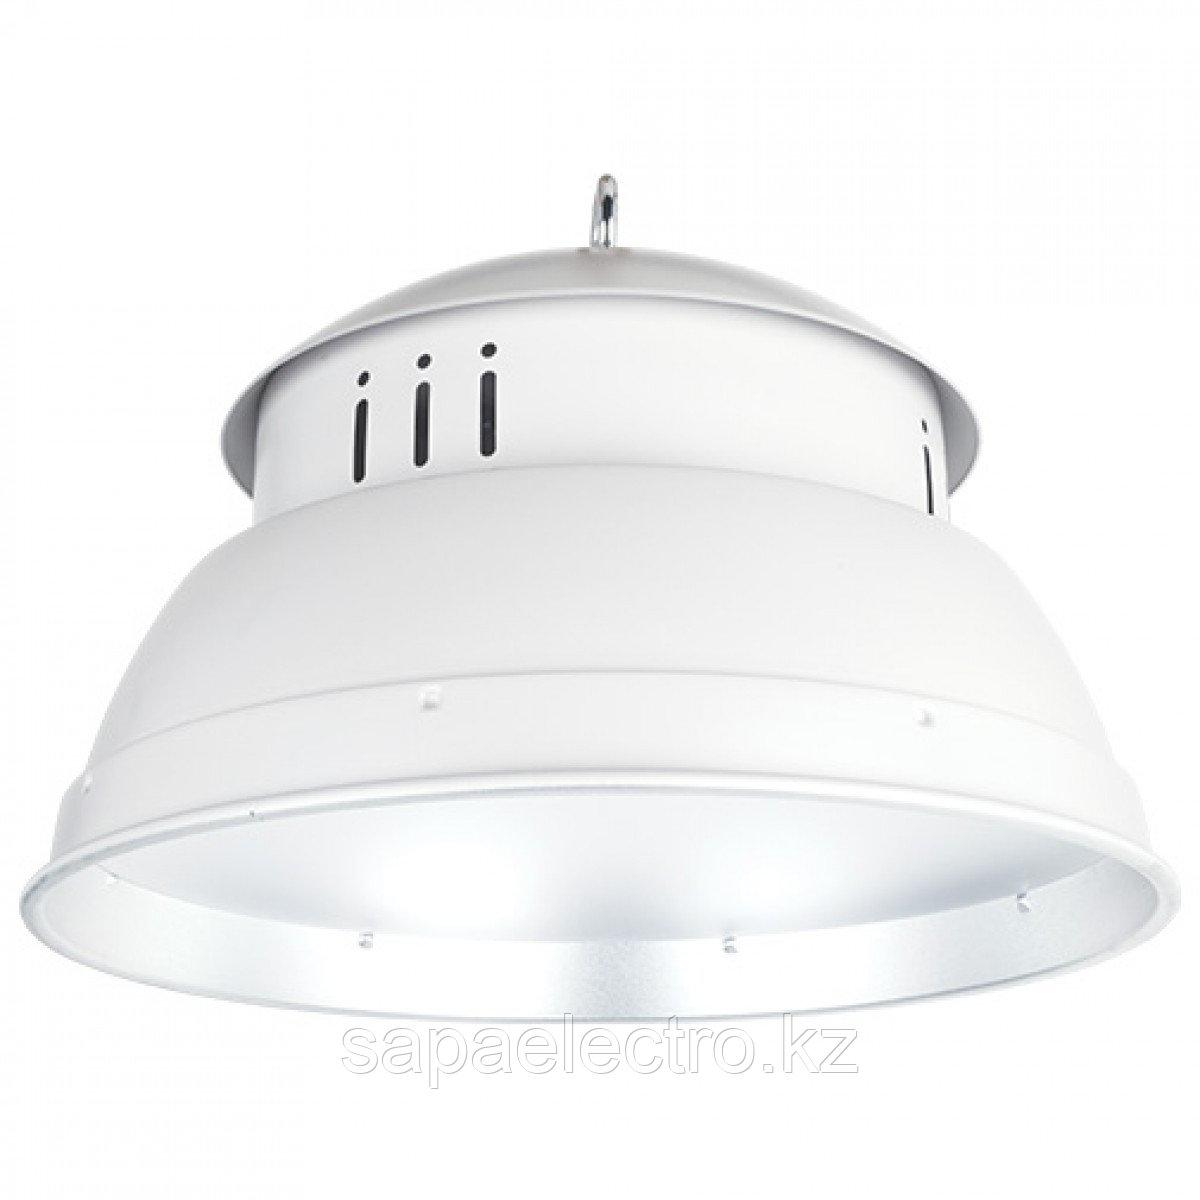 Свет-к LED TS-HB 200W 5500K SILVER (TEKSAN)1шт